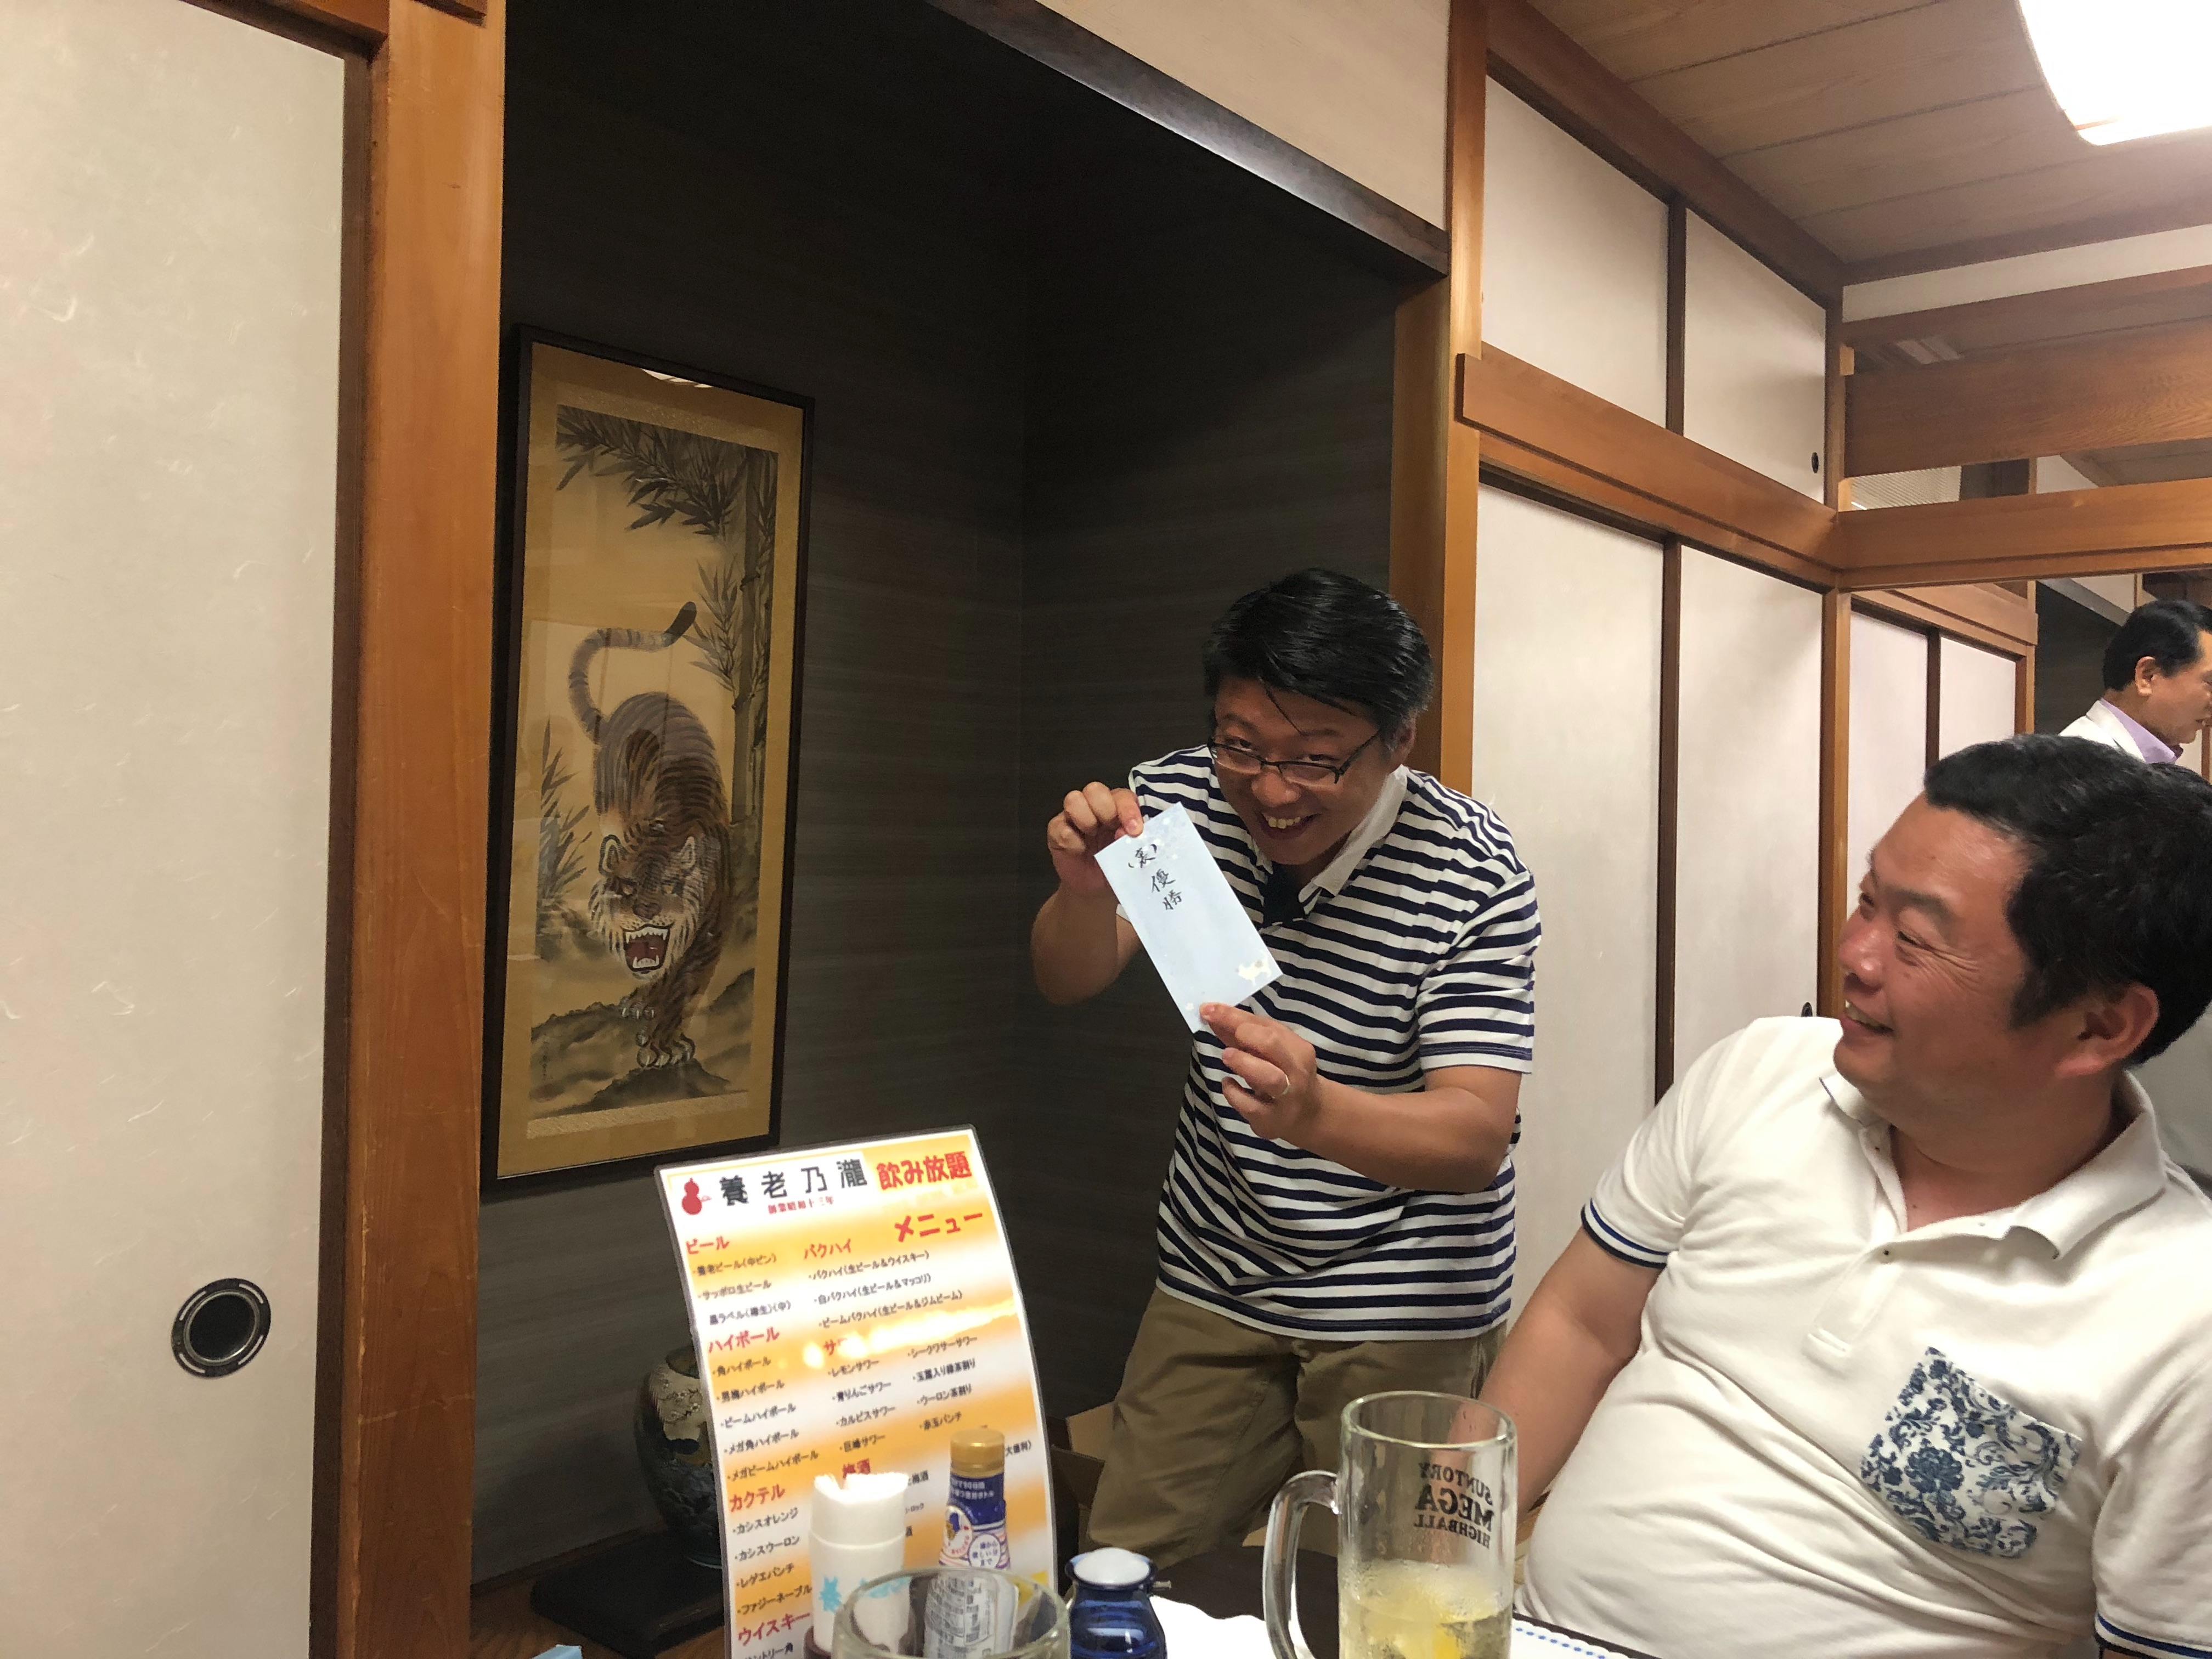 f:id:masanori-kato1972:20190519072407j:image